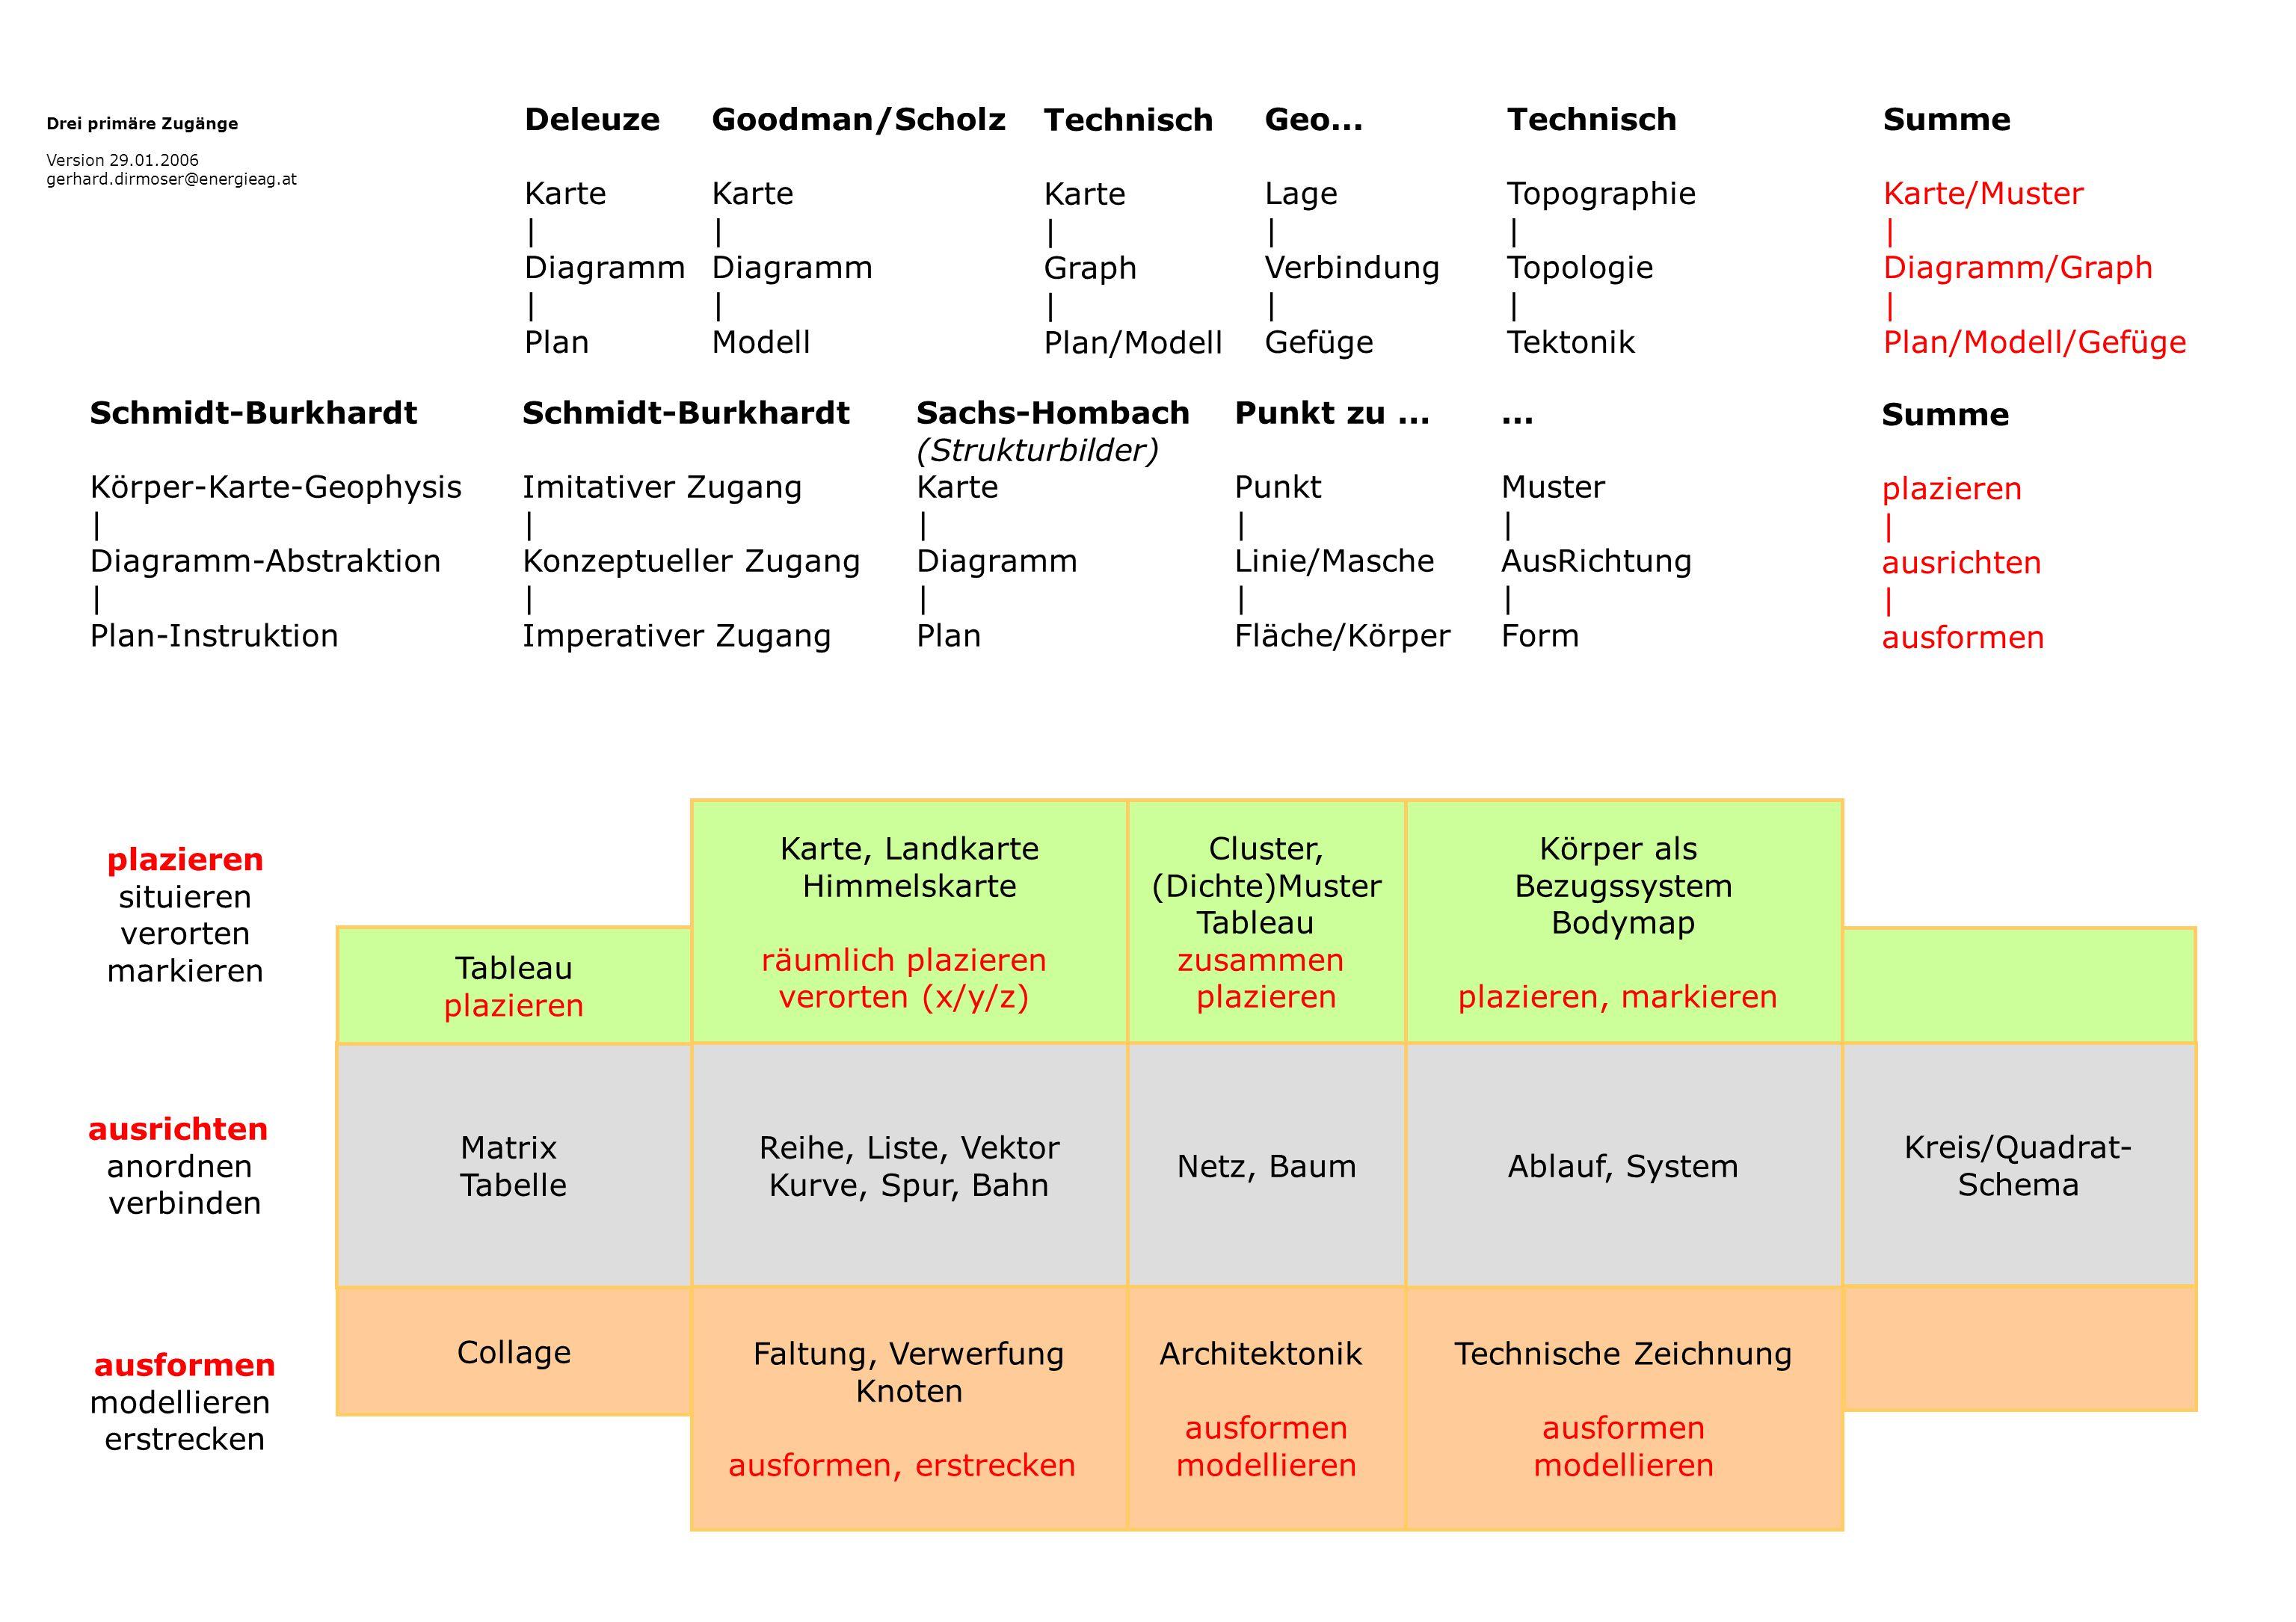 Collage Netz, Baum Matrix Tabelle Drei primäre Zugänge Version 29.01.2006 gerhard.dirmoser@energieag.at Reihe, Liste, Vektor Kurve, Spur, Bahn Karte,